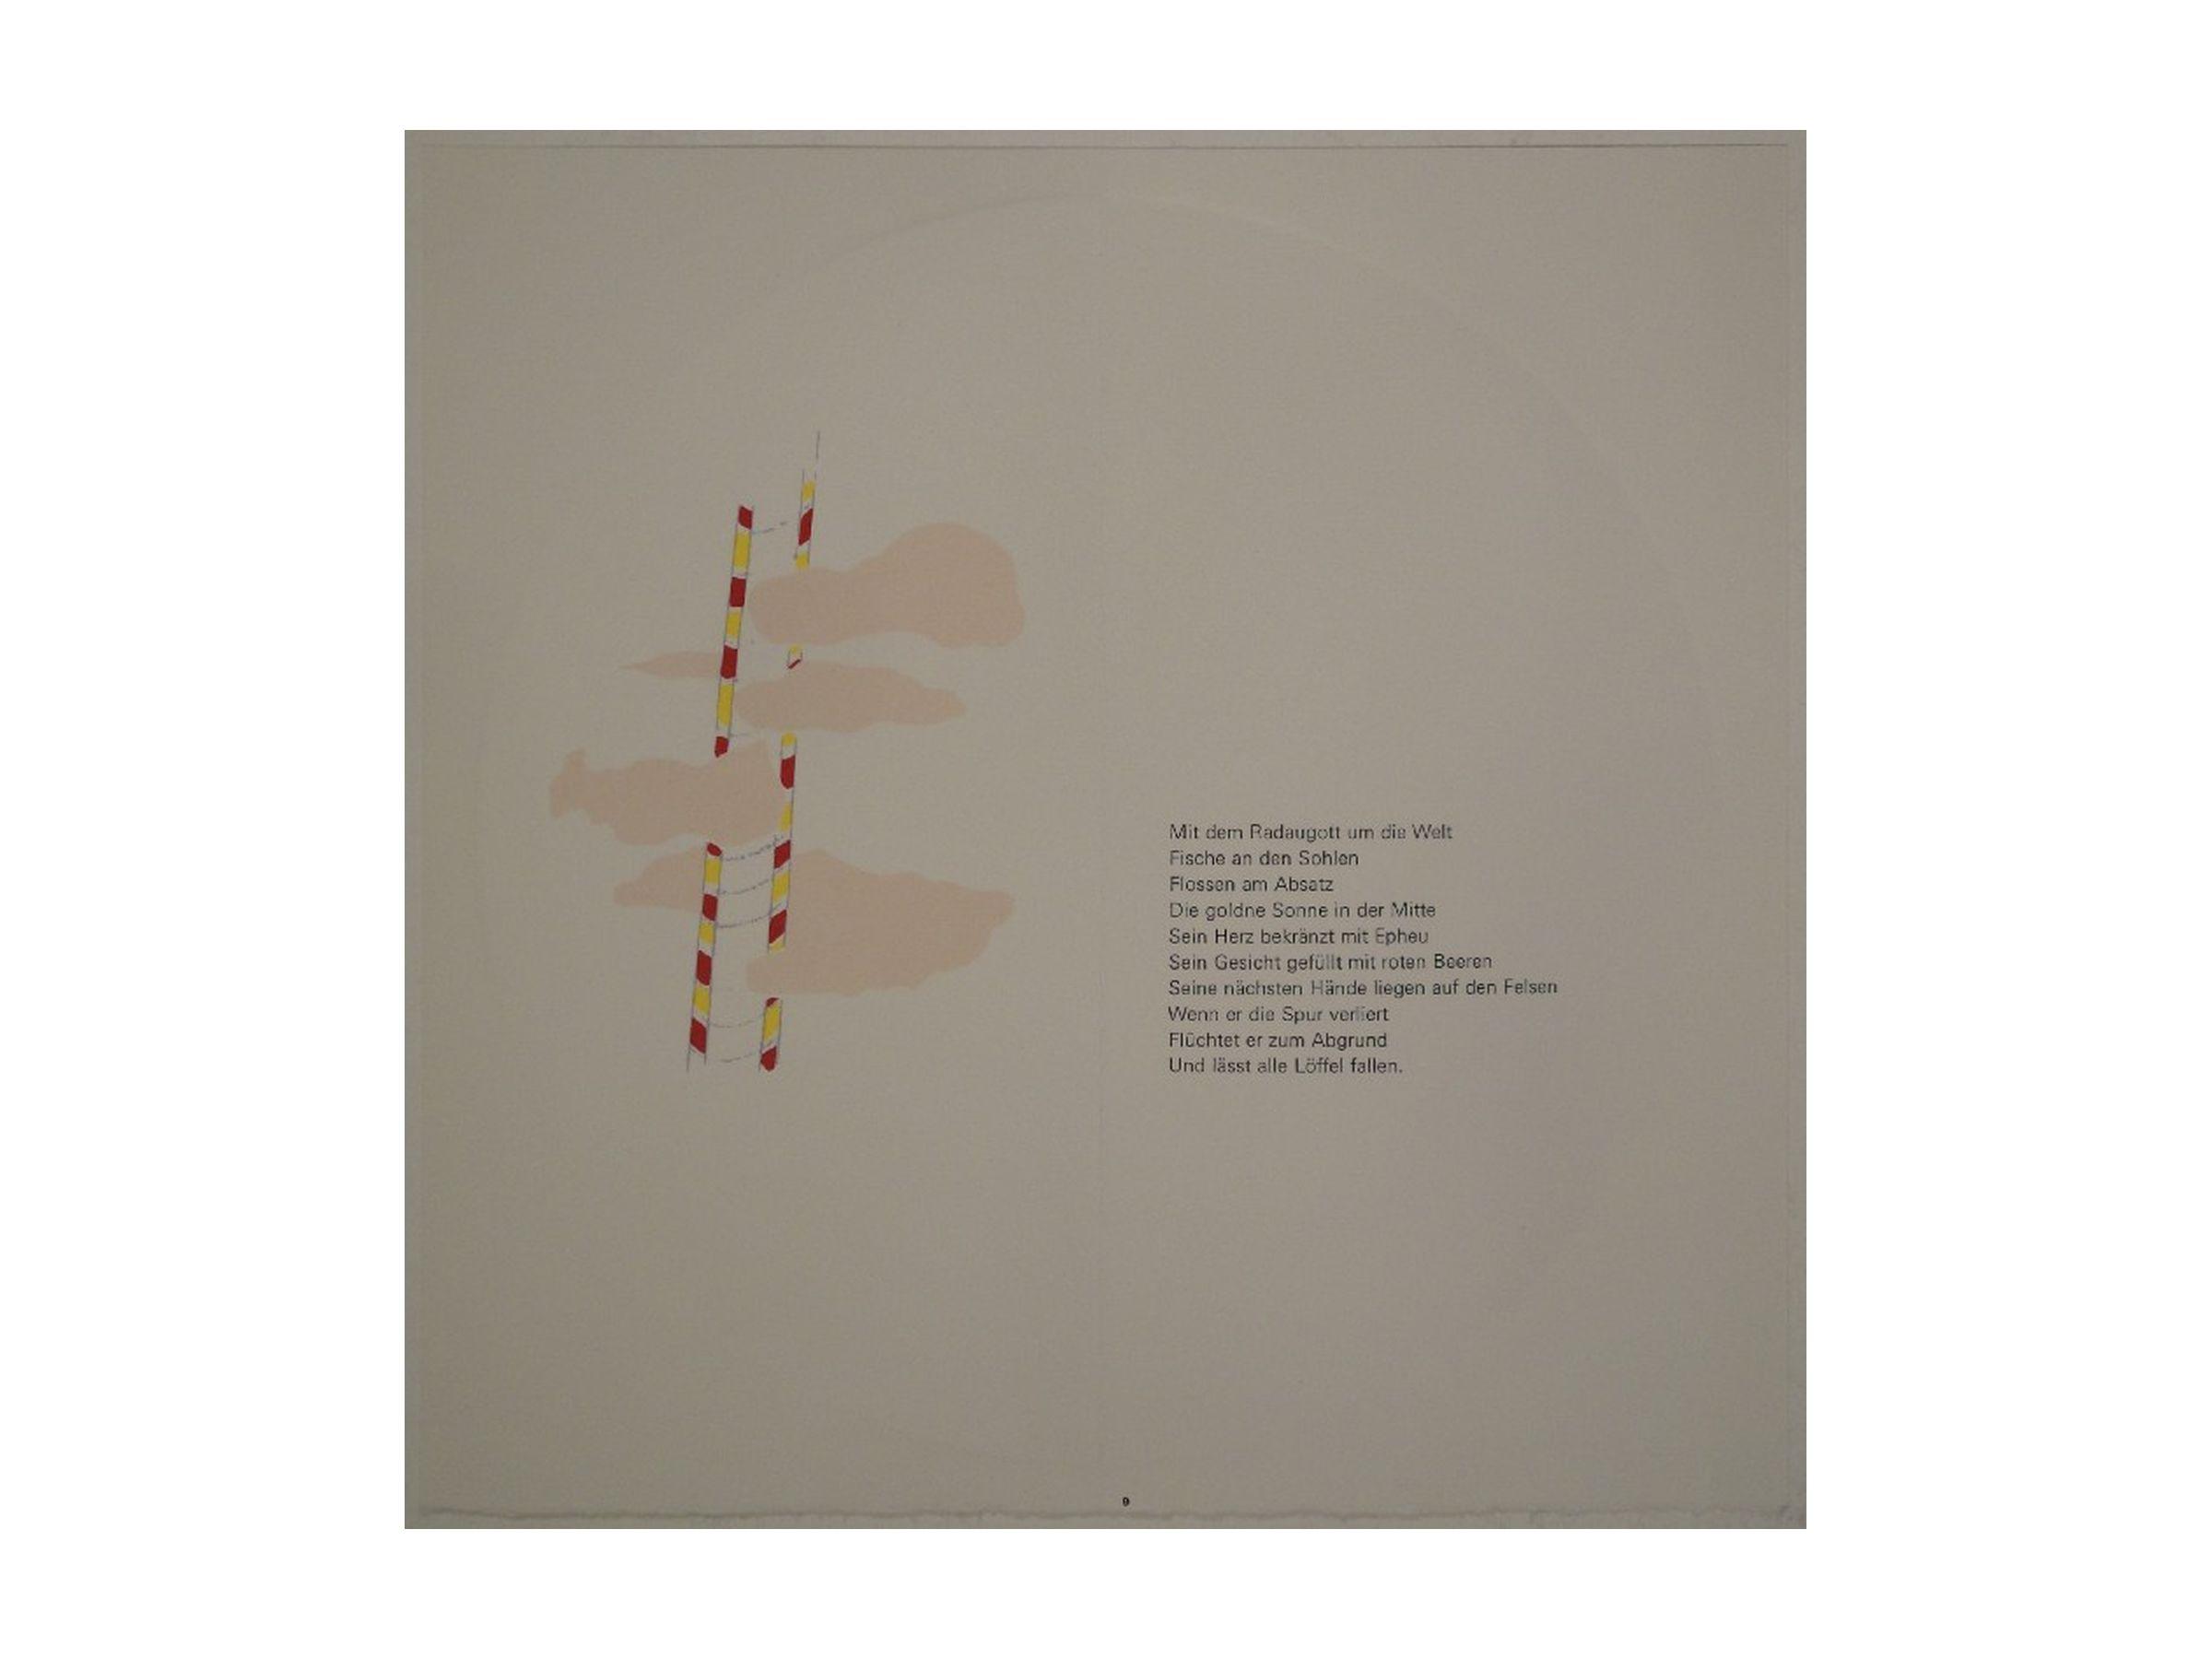 Oppenheim-Sansibar-carrousel-3